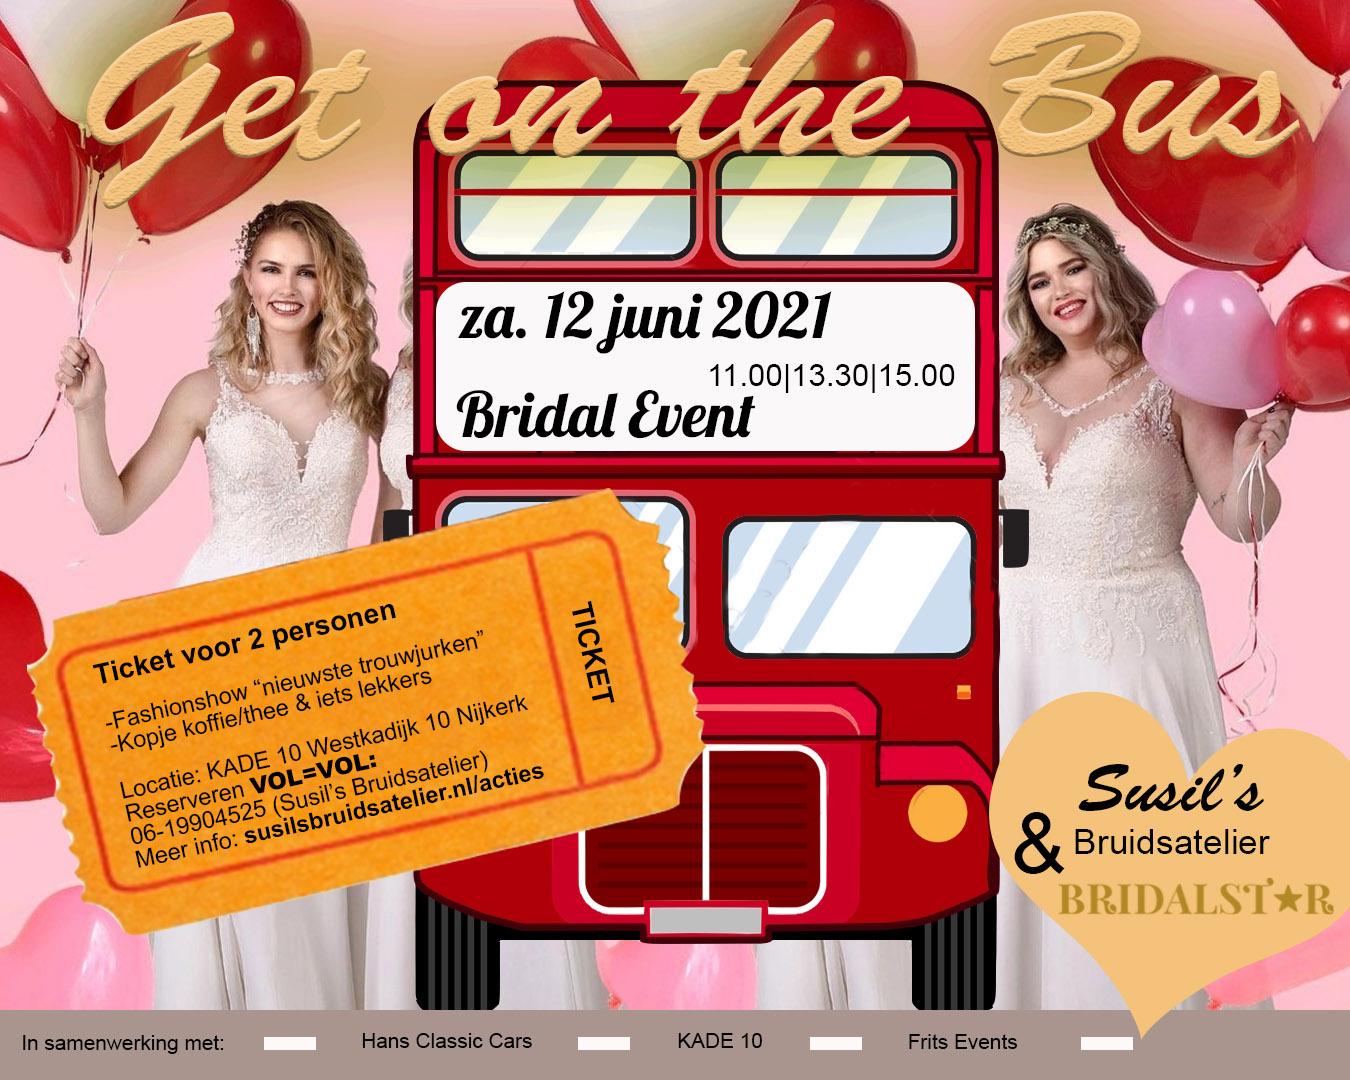 trouwjurken bruidsshow bus